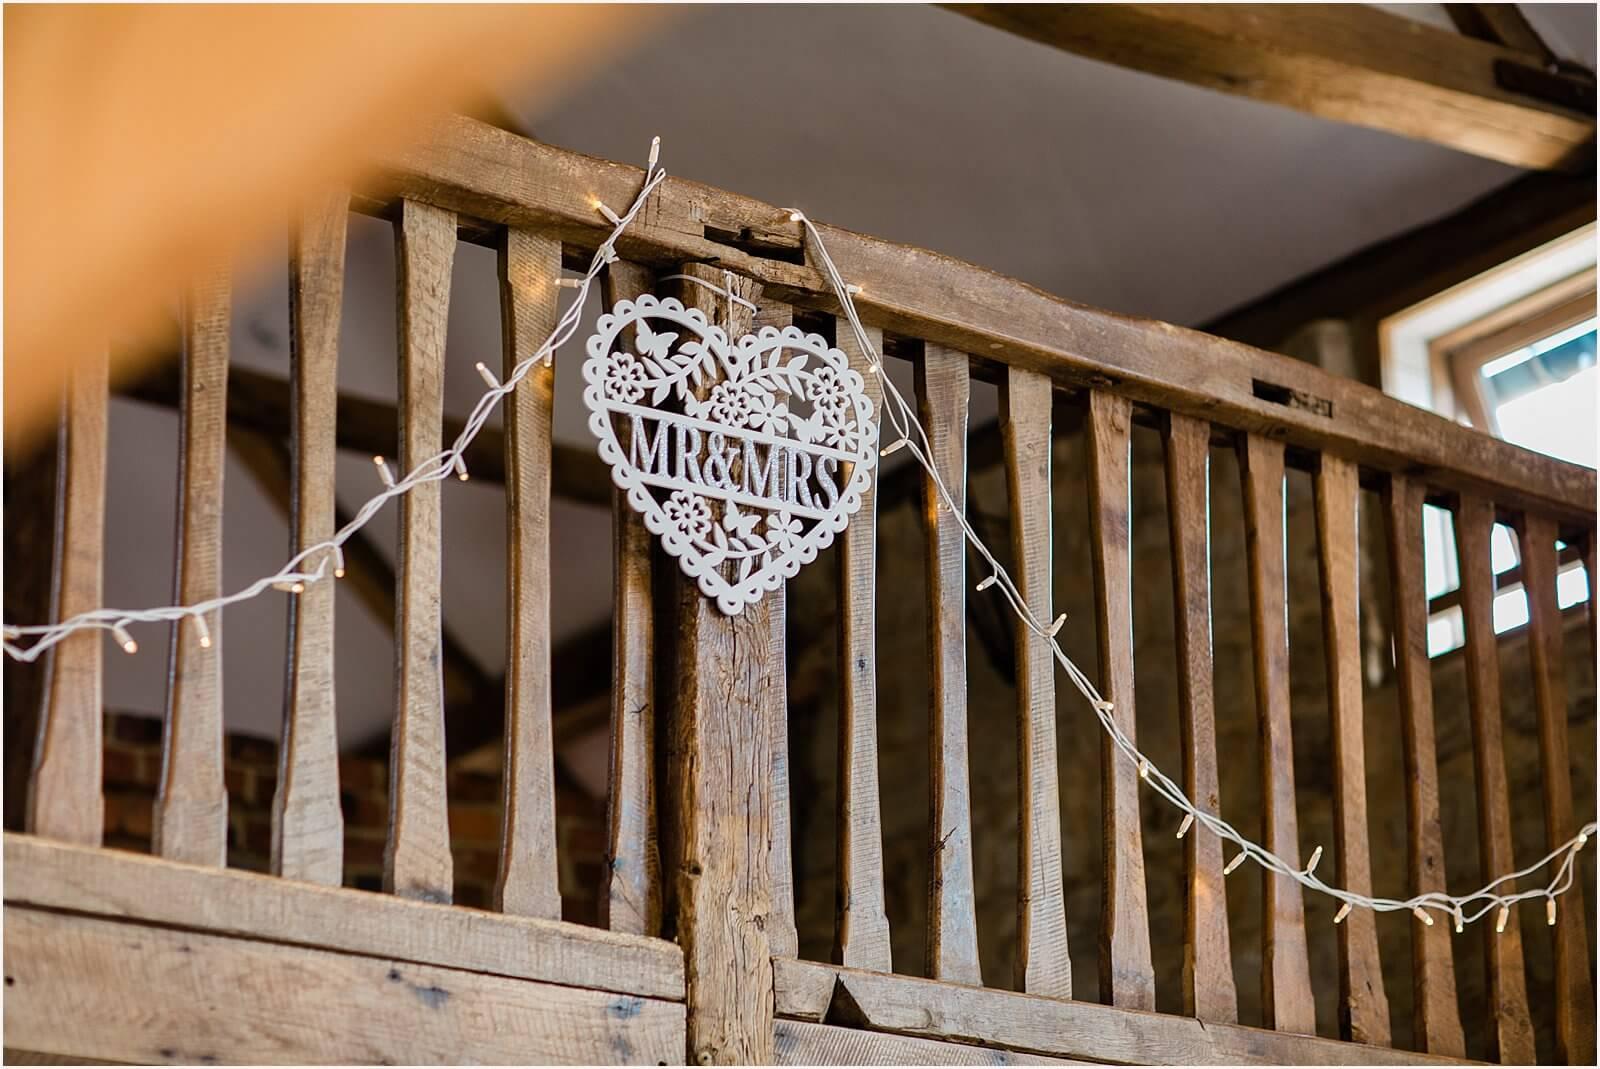 Swallows Oast Wedding - Jakki + Luke's barn wedding photography 44